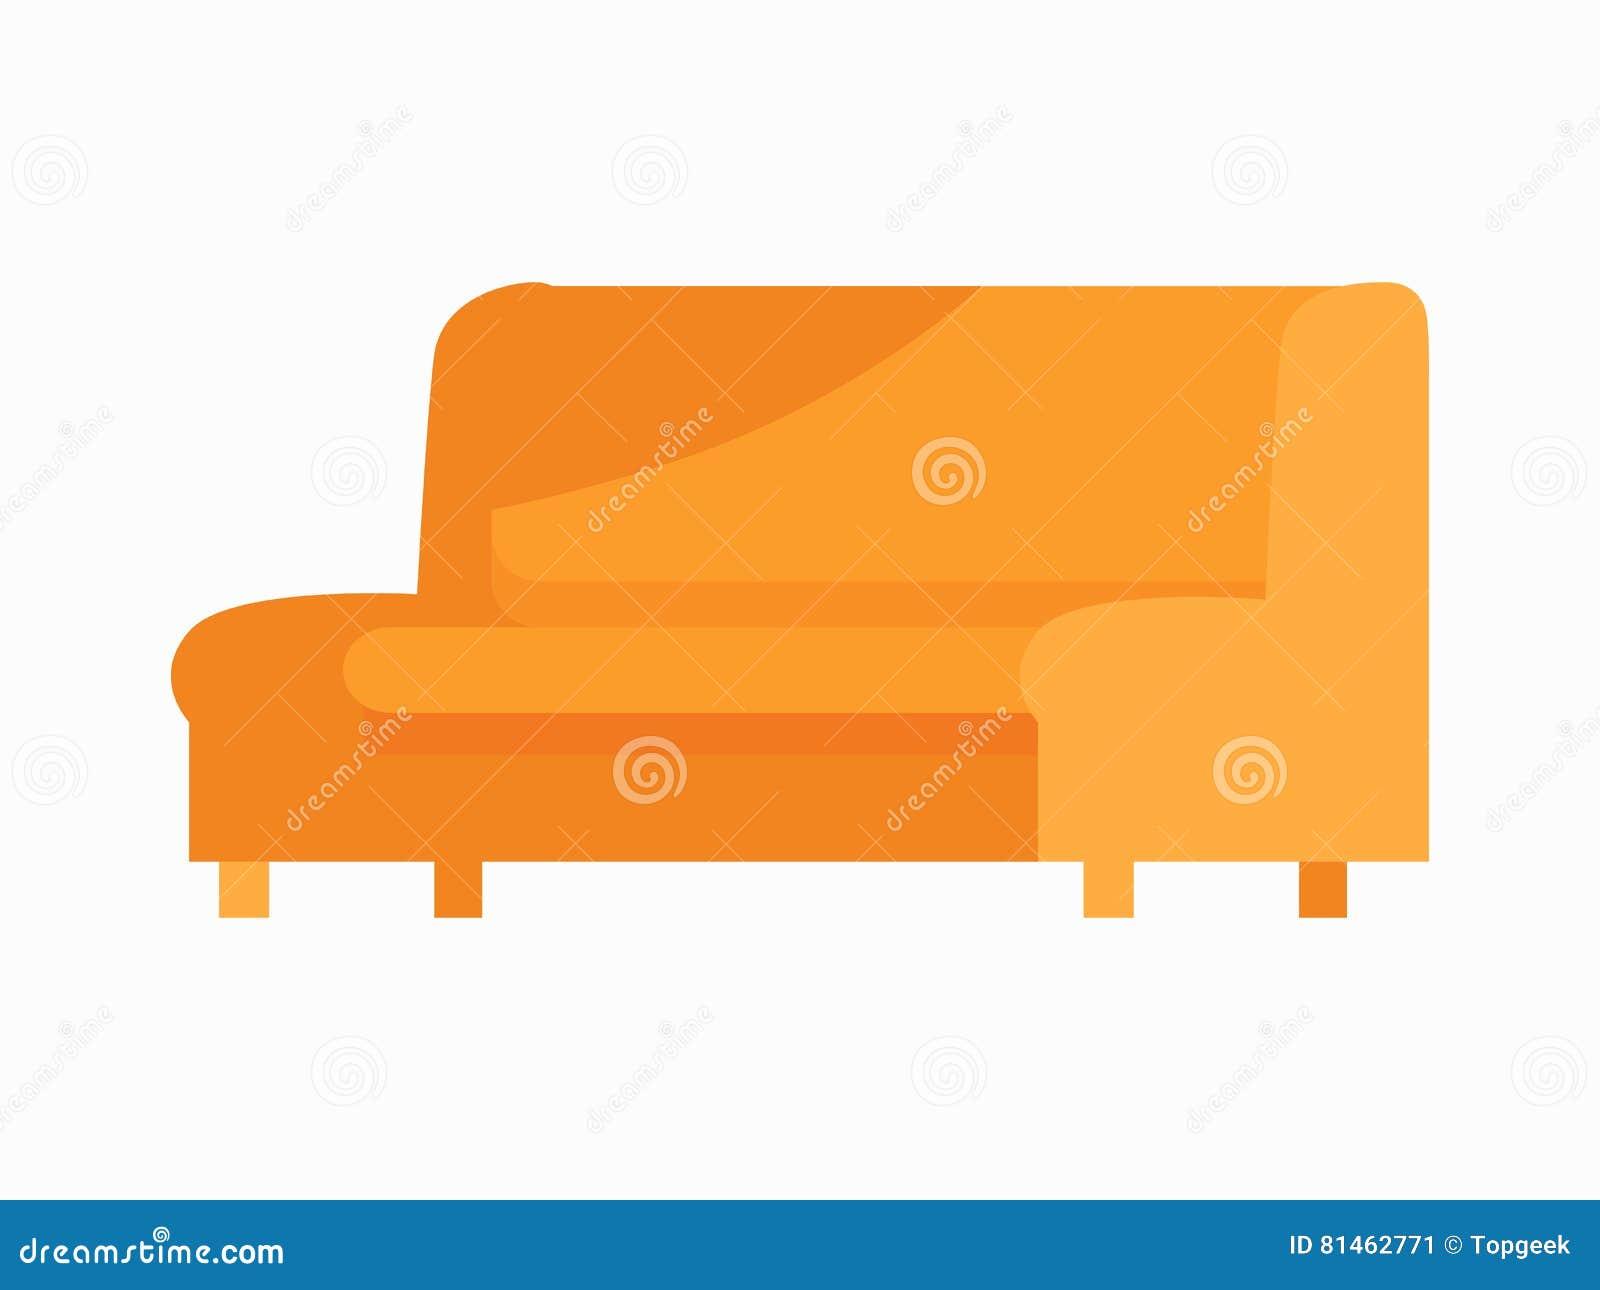 Phenomenal Luxury Leather Sofa For Modern Room Reception Stock Vector Dailytribune Chair Design For Home Dailytribuneorg